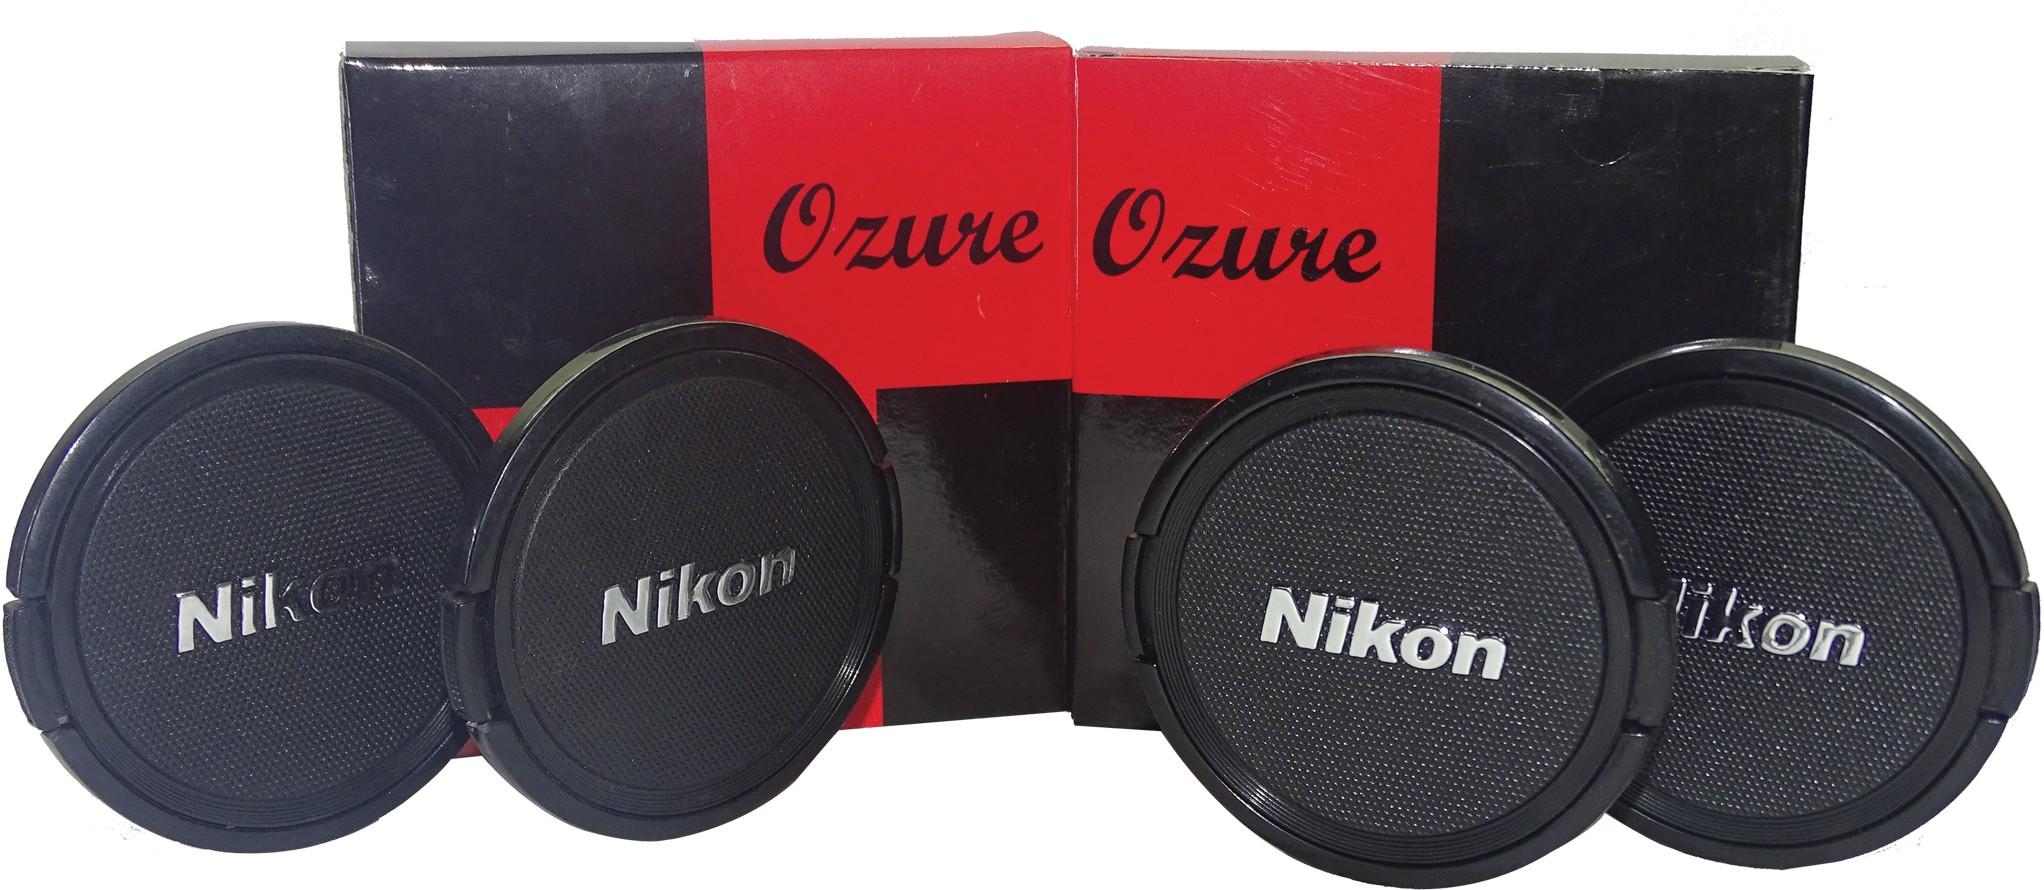 Ozure SECLCN67B  Lens Cap(Black + Silver Embossed, 67 mm)